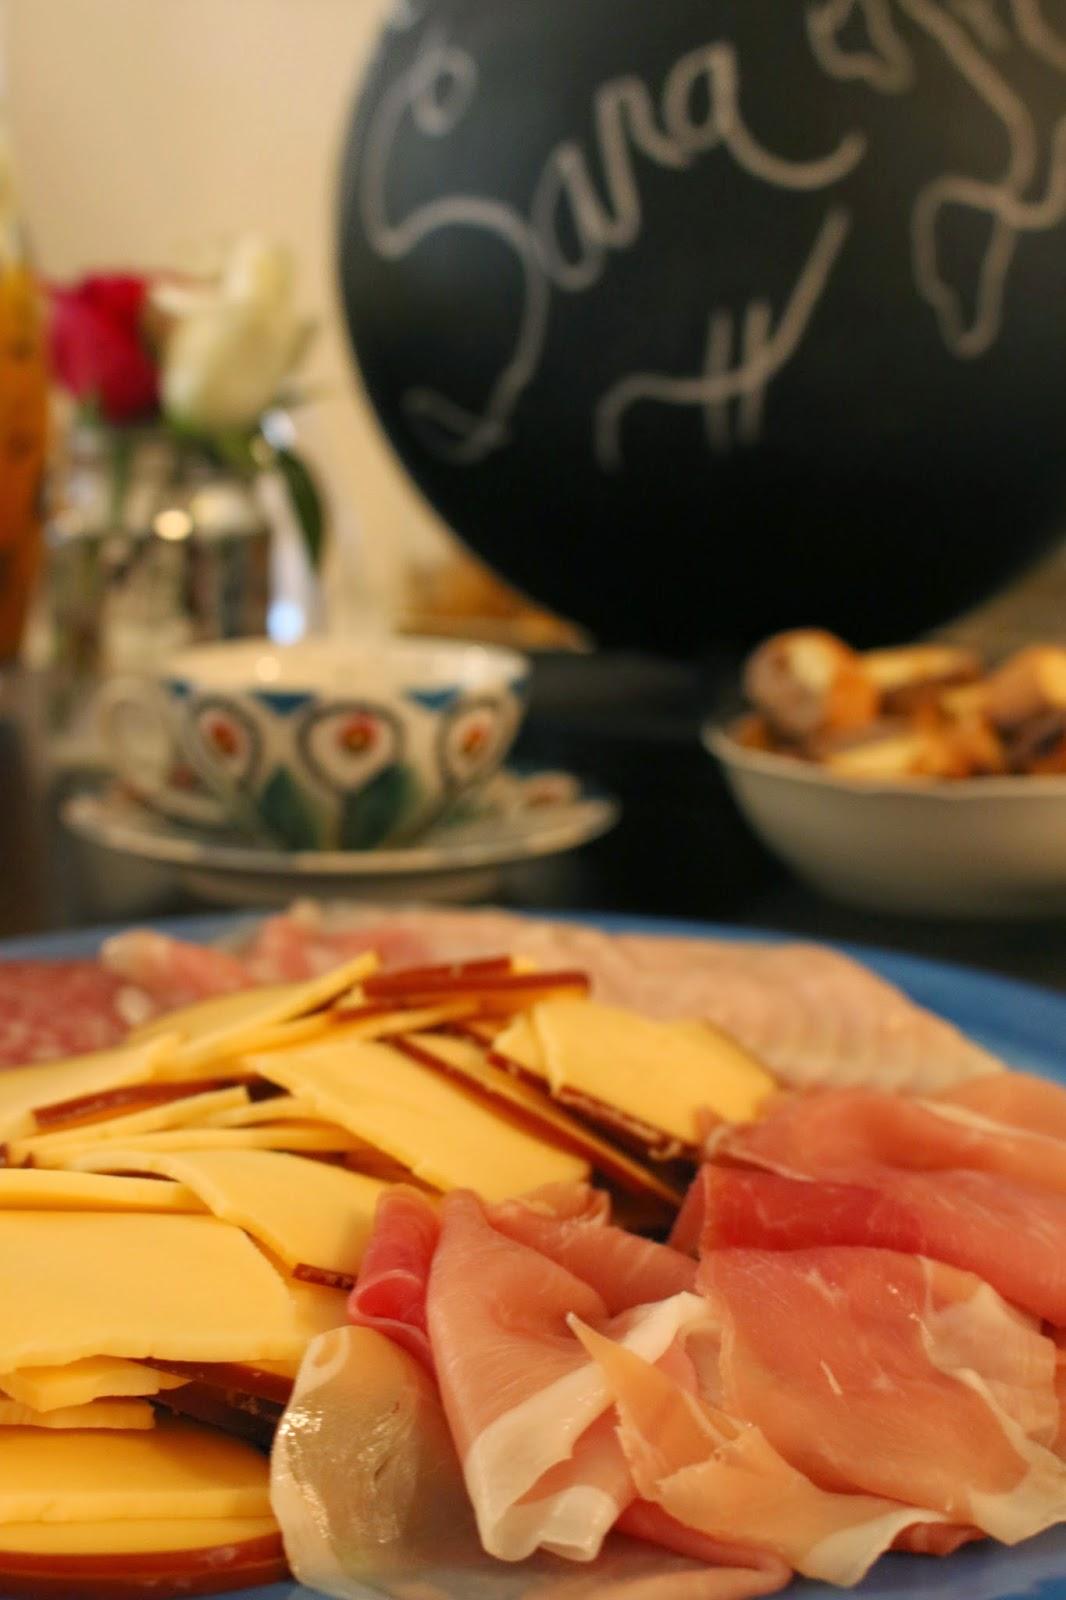 Arrivederci Tea Party and a Recipe for Peach Basil Sangria